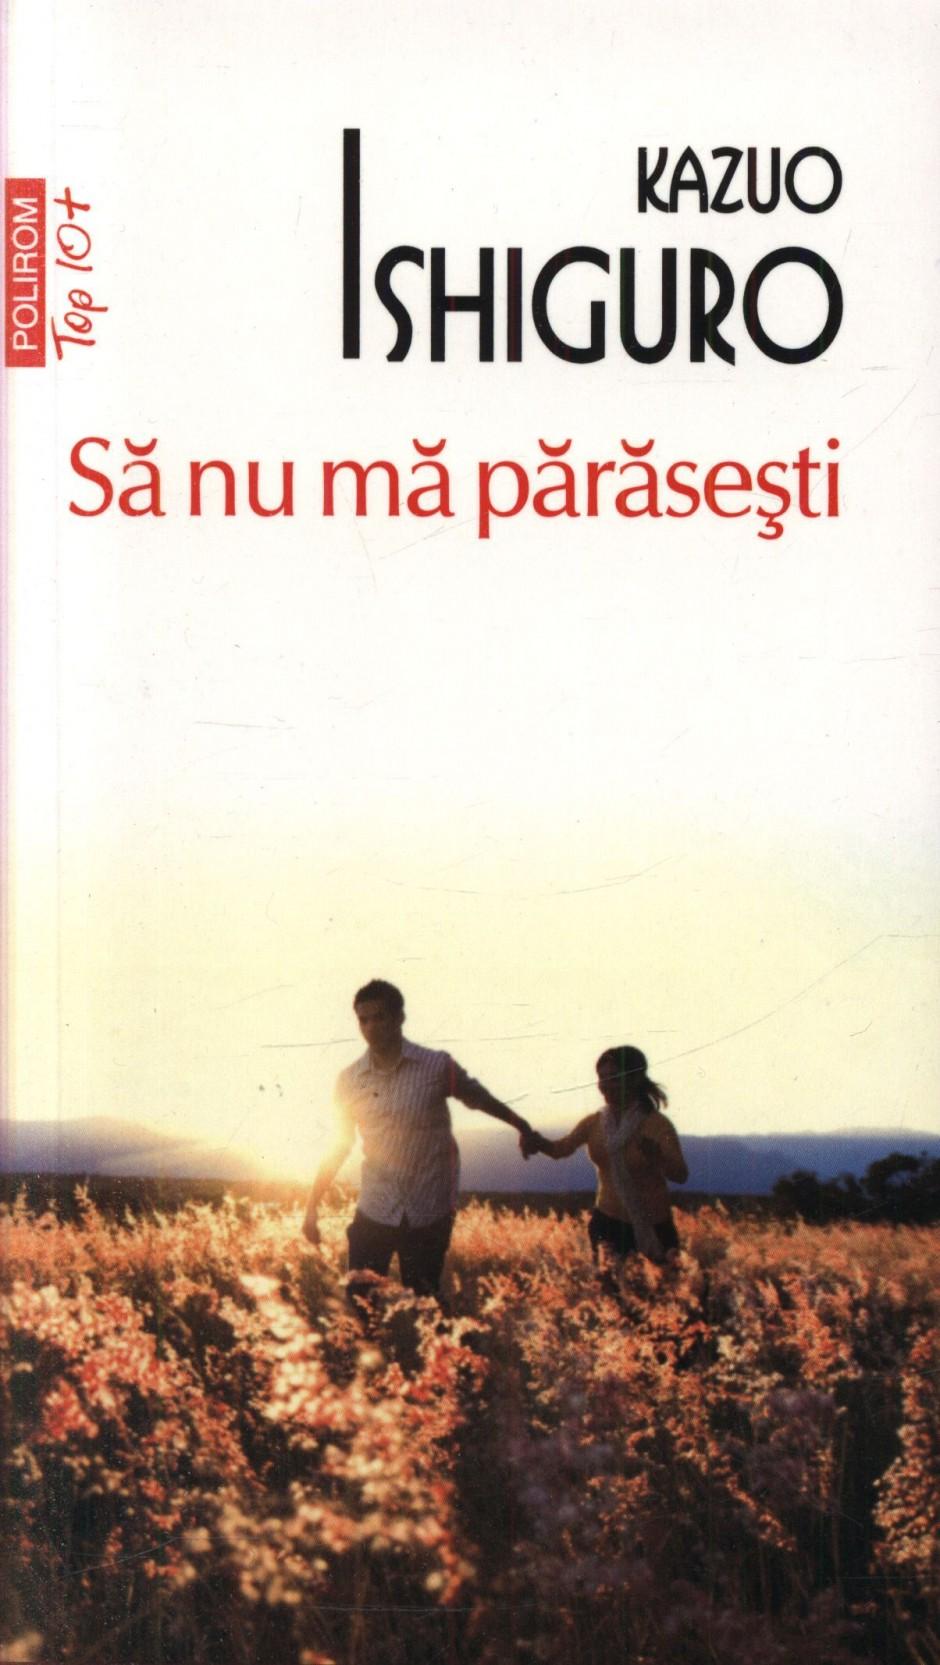 sa-nu-ma-parasesti-top10_1_fullsize